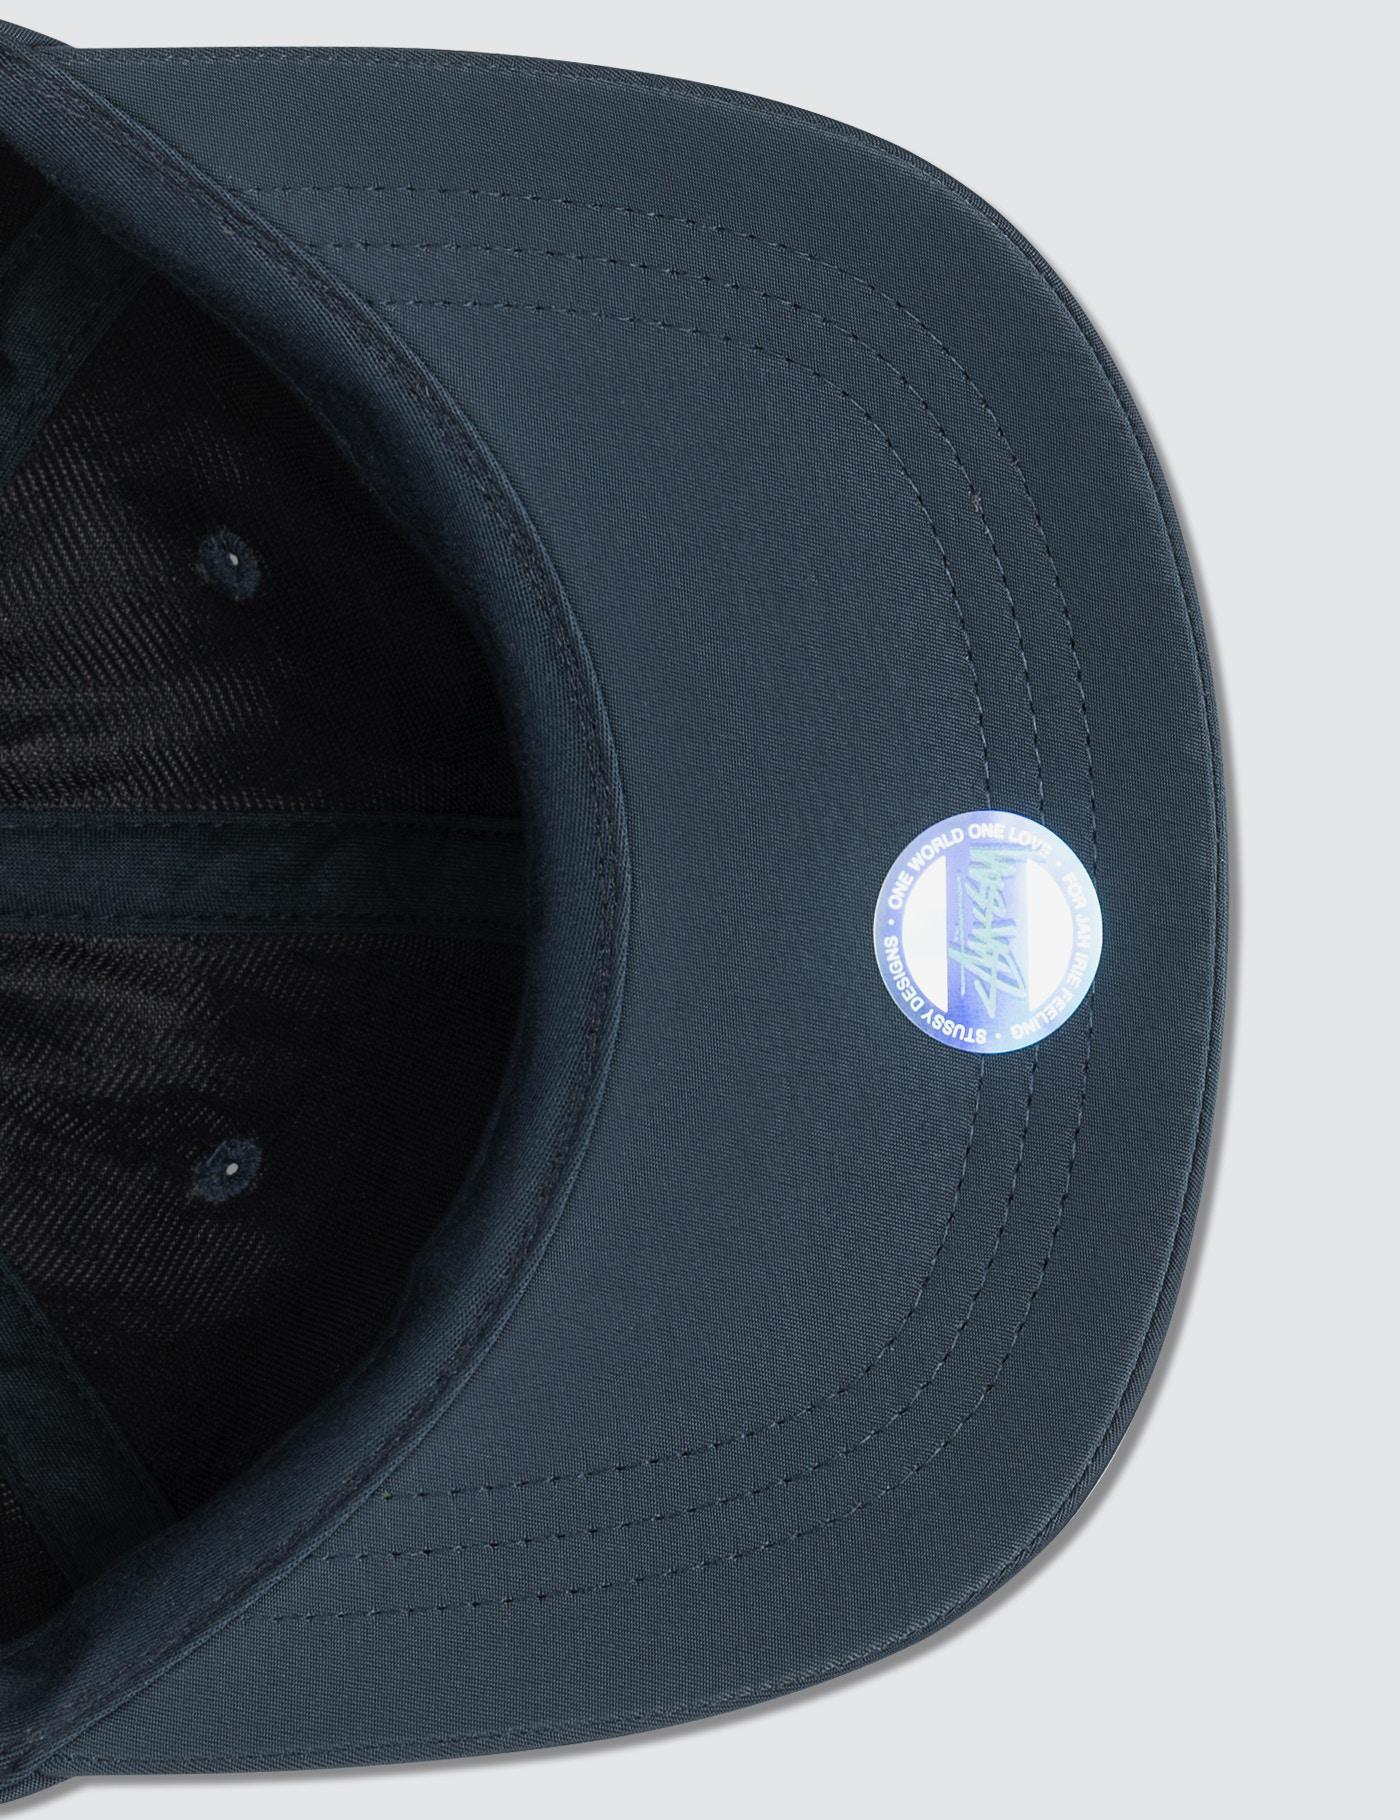 ab0ba207781 Stussy Helvetica Nylon Low Pro Cap in Blue for Men - Lyst